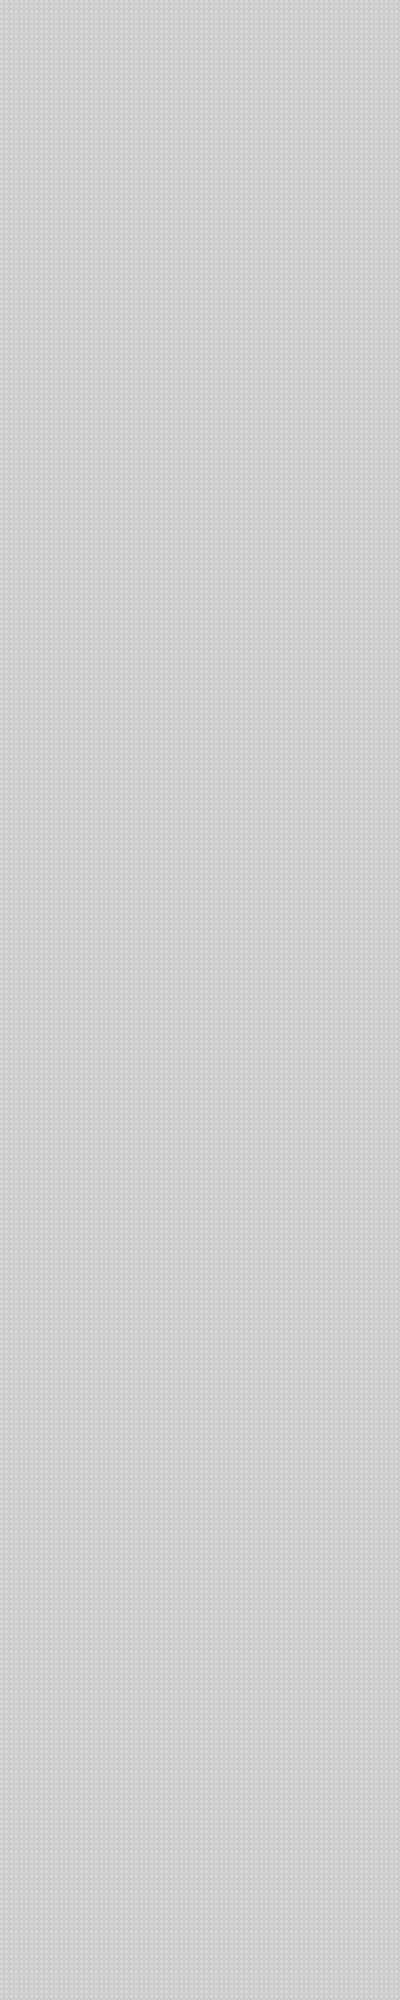 sidebar-background.png